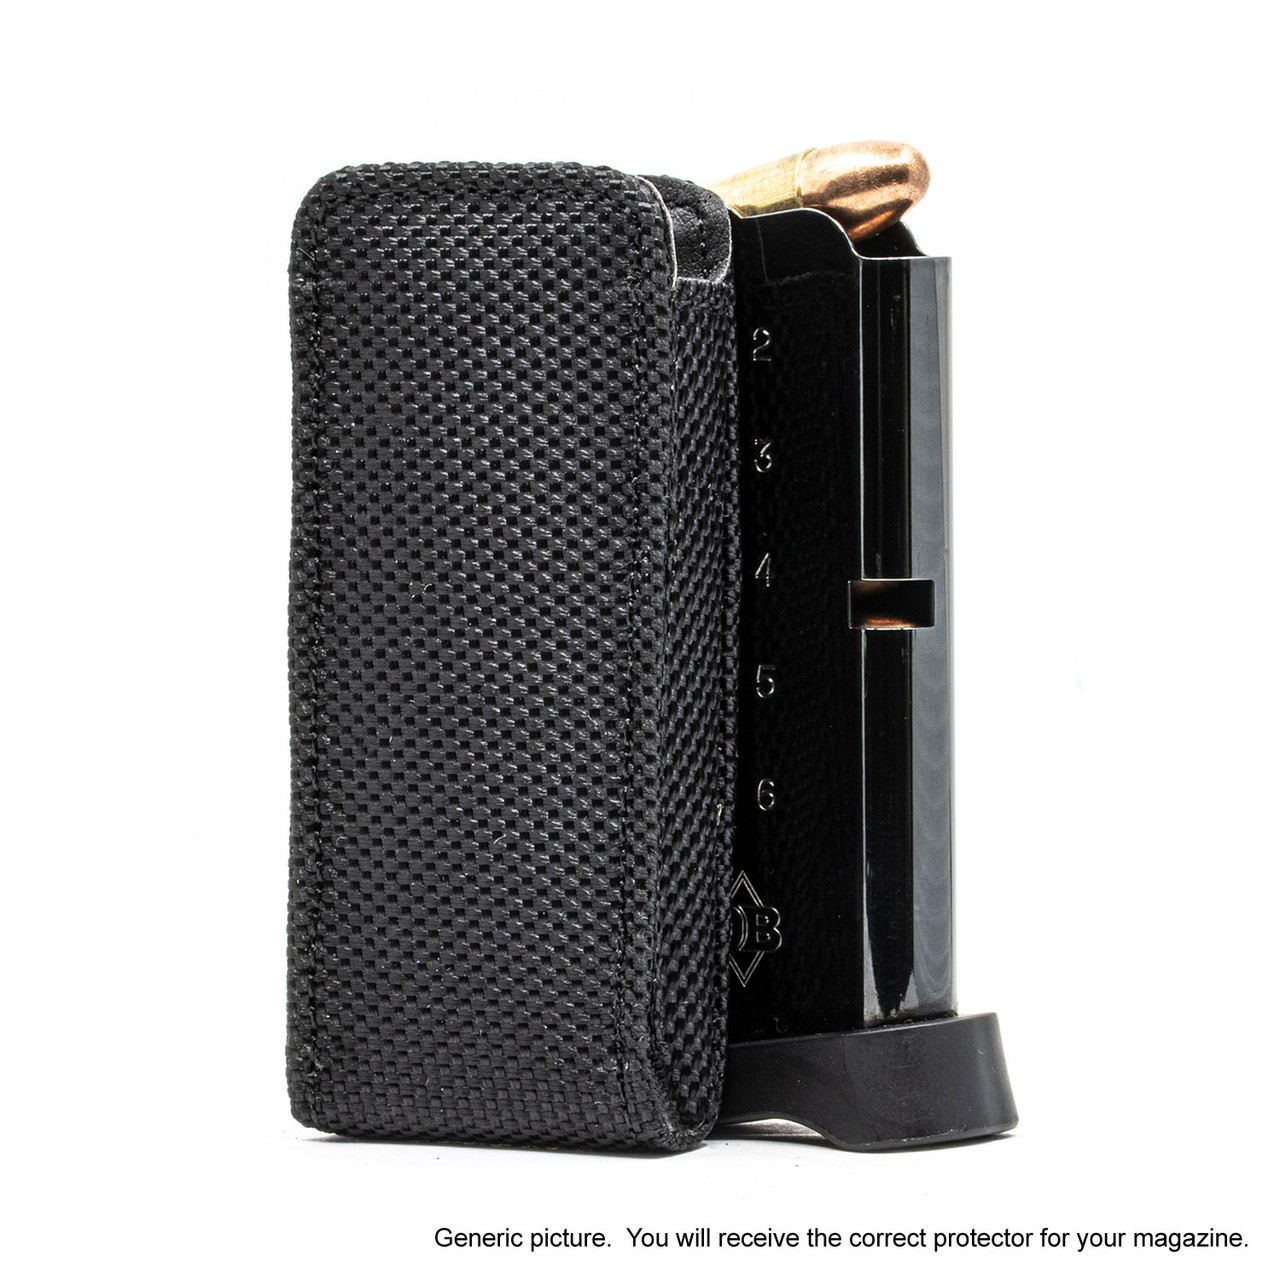 CZ 2075 Rami Black Ballistic Nylon Magazine Pocket Protector